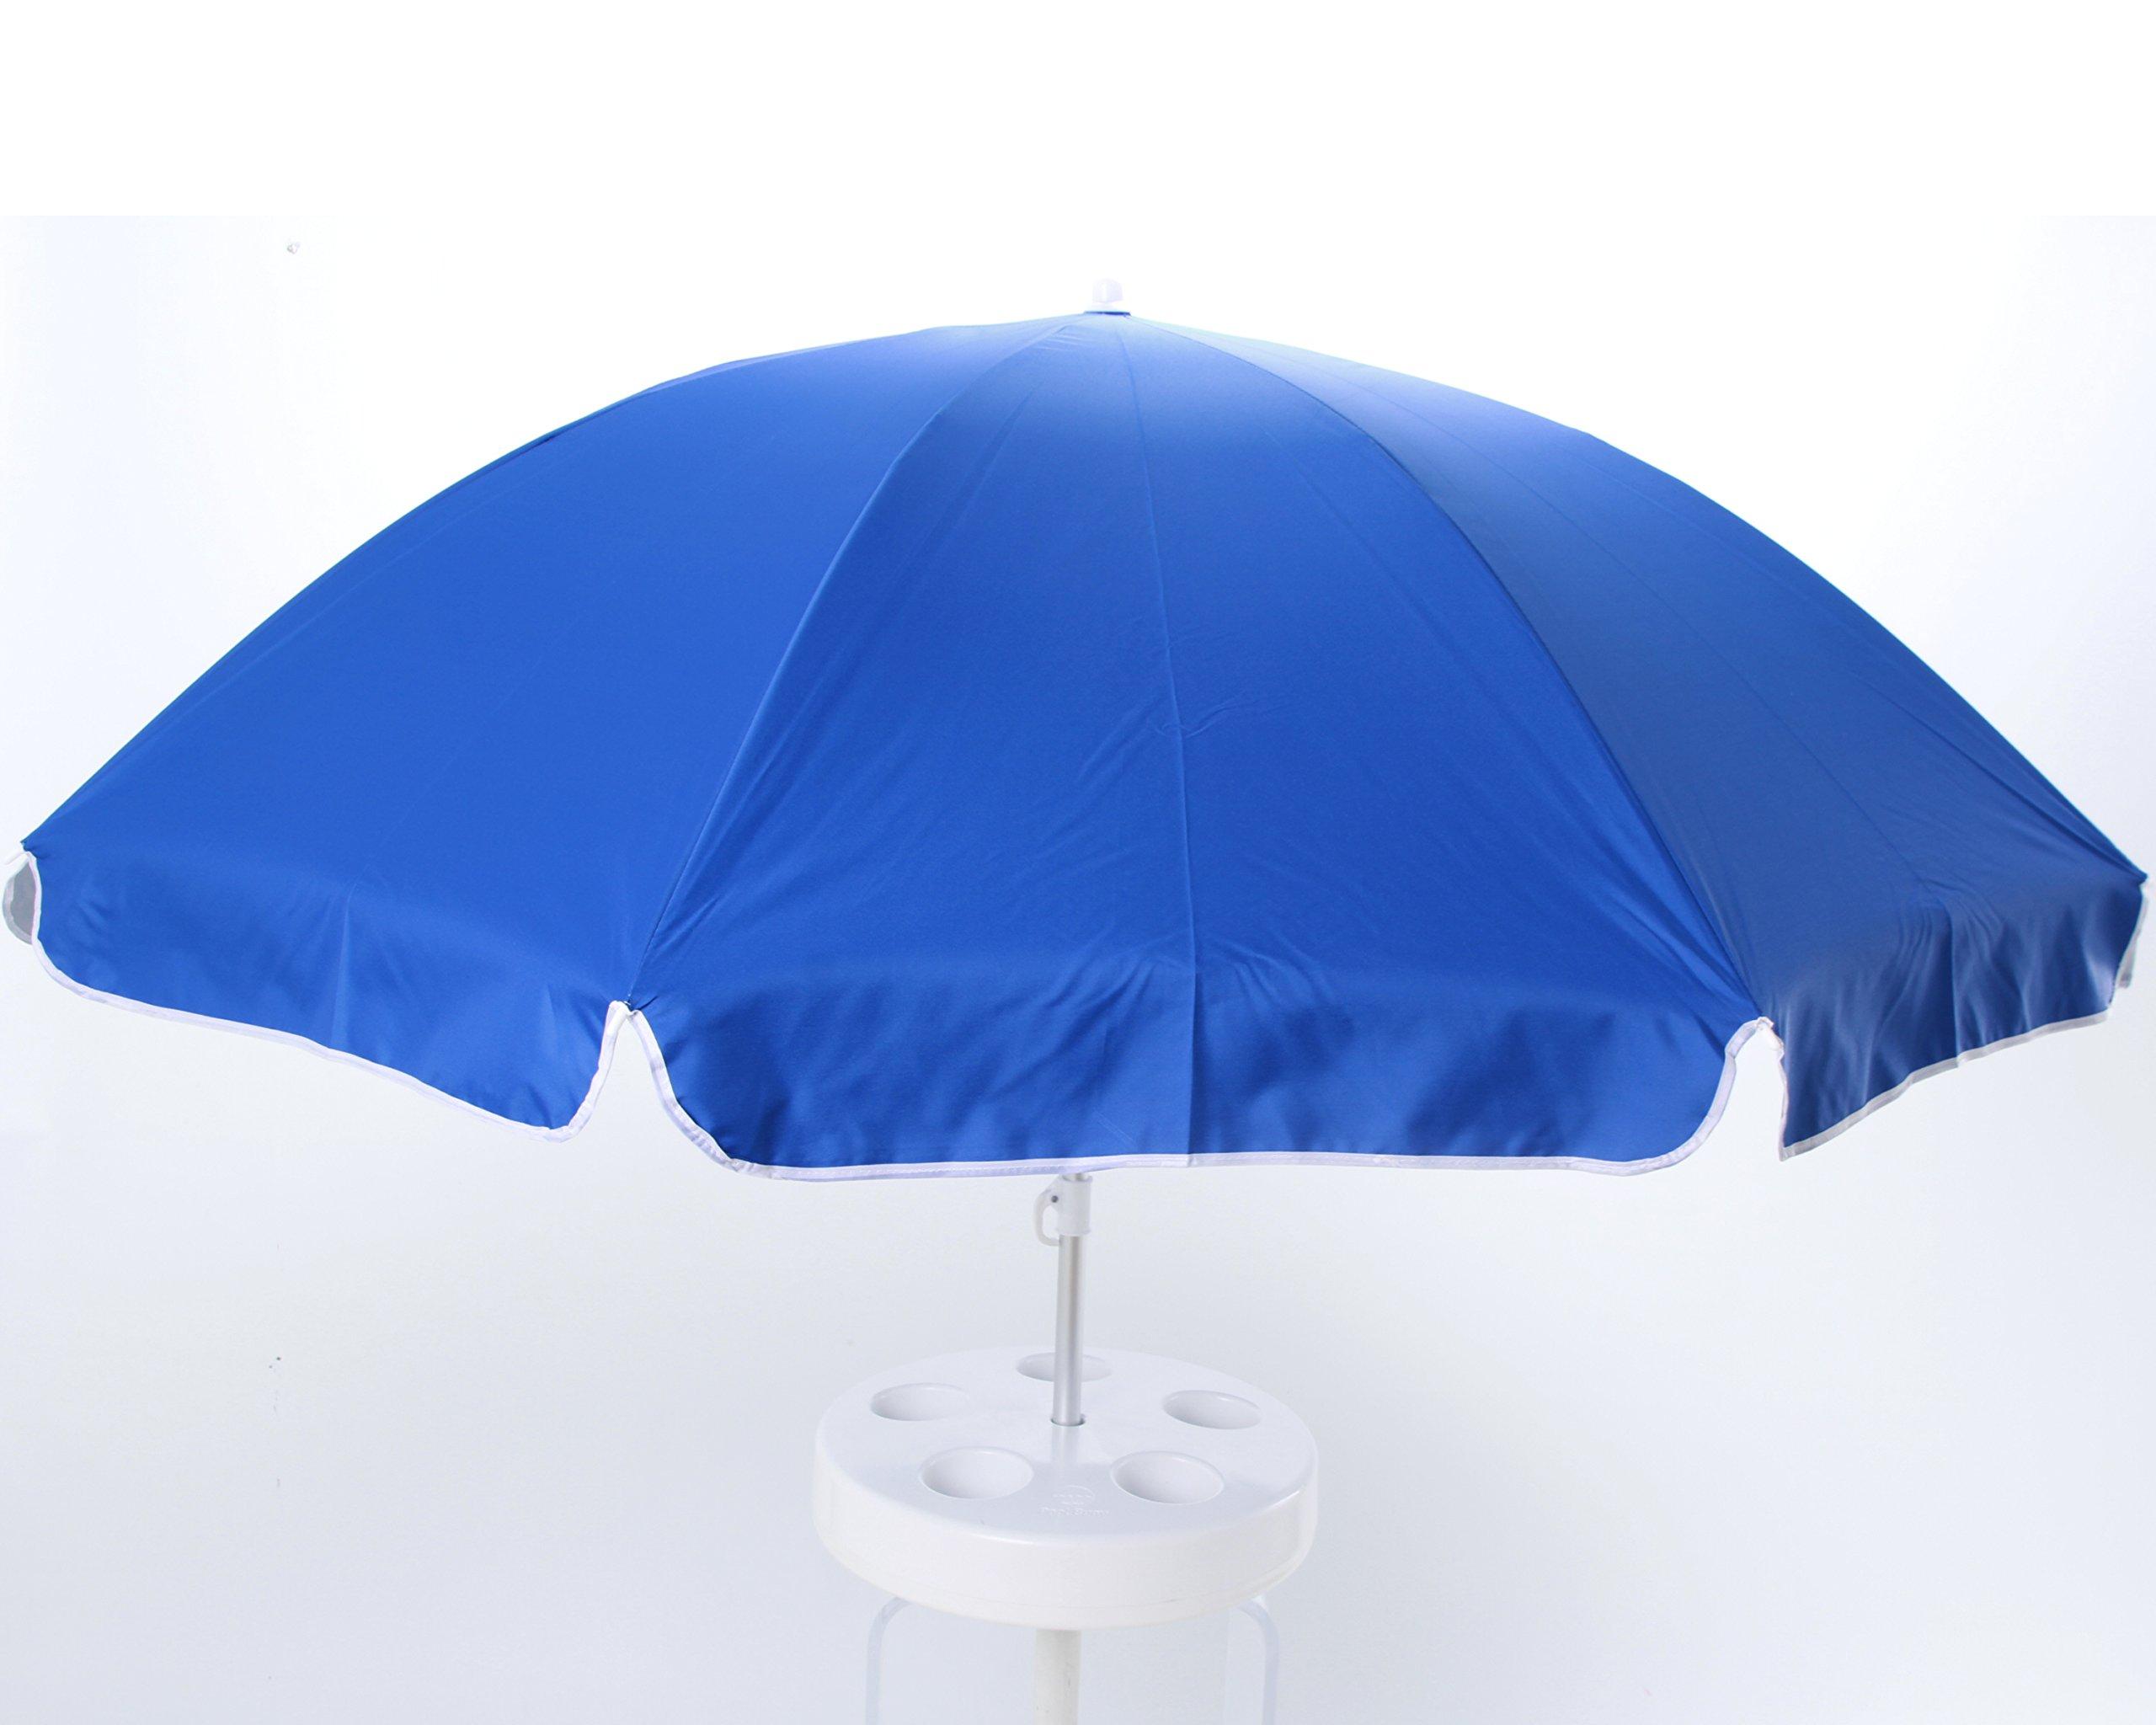 Pool Buoy Original Floating Umbrella and Buoy - Atlantic Blue